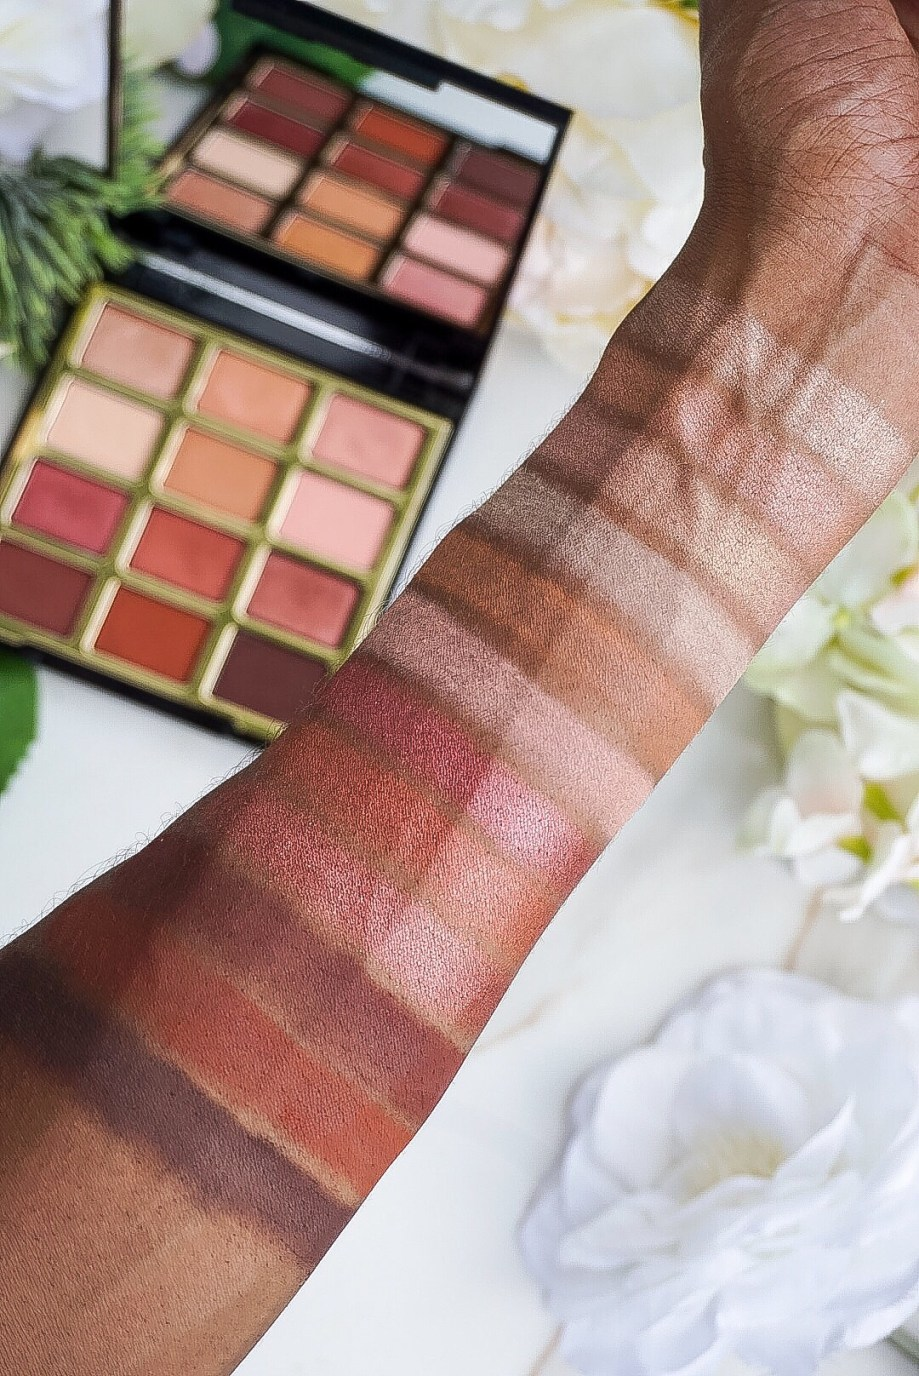 Milani Pure Passion Eyeshadow Palette Swatches on Dark Skin